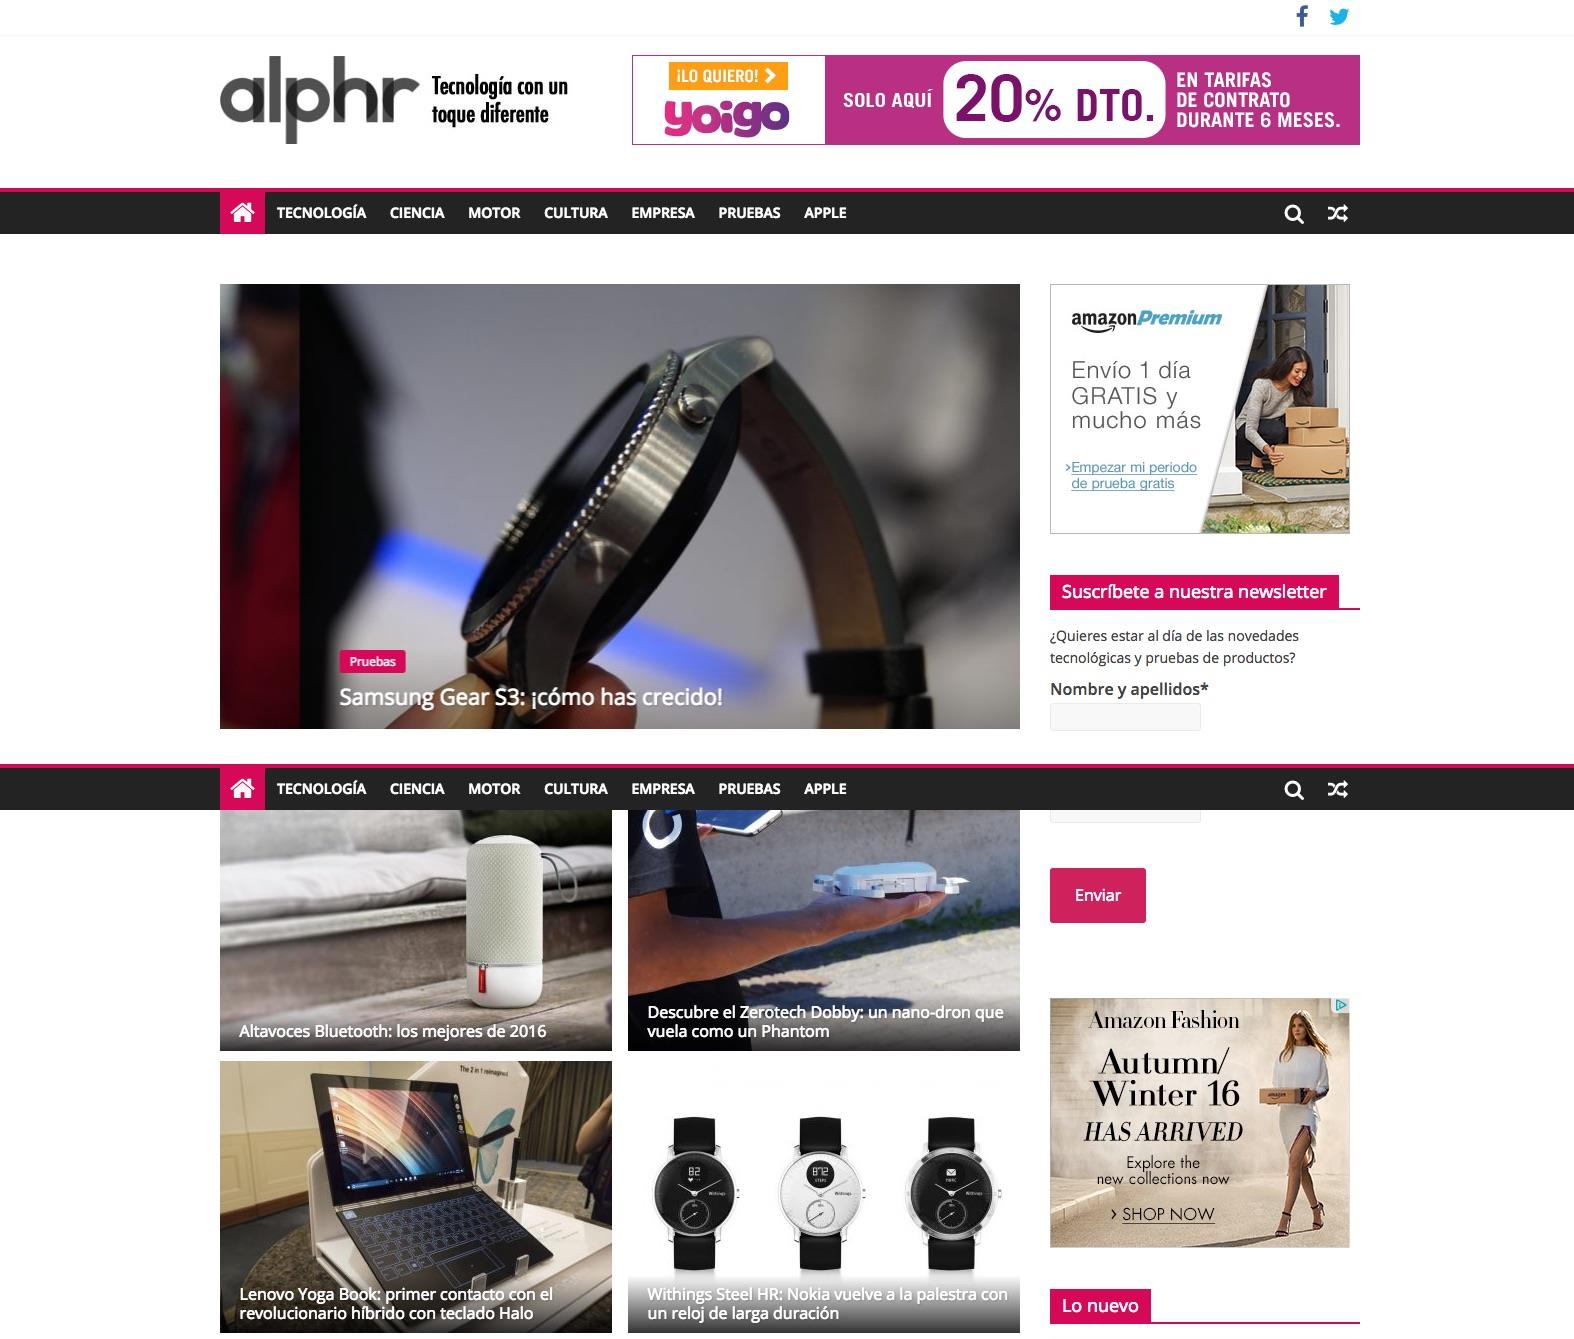 Alphr Spain website ()